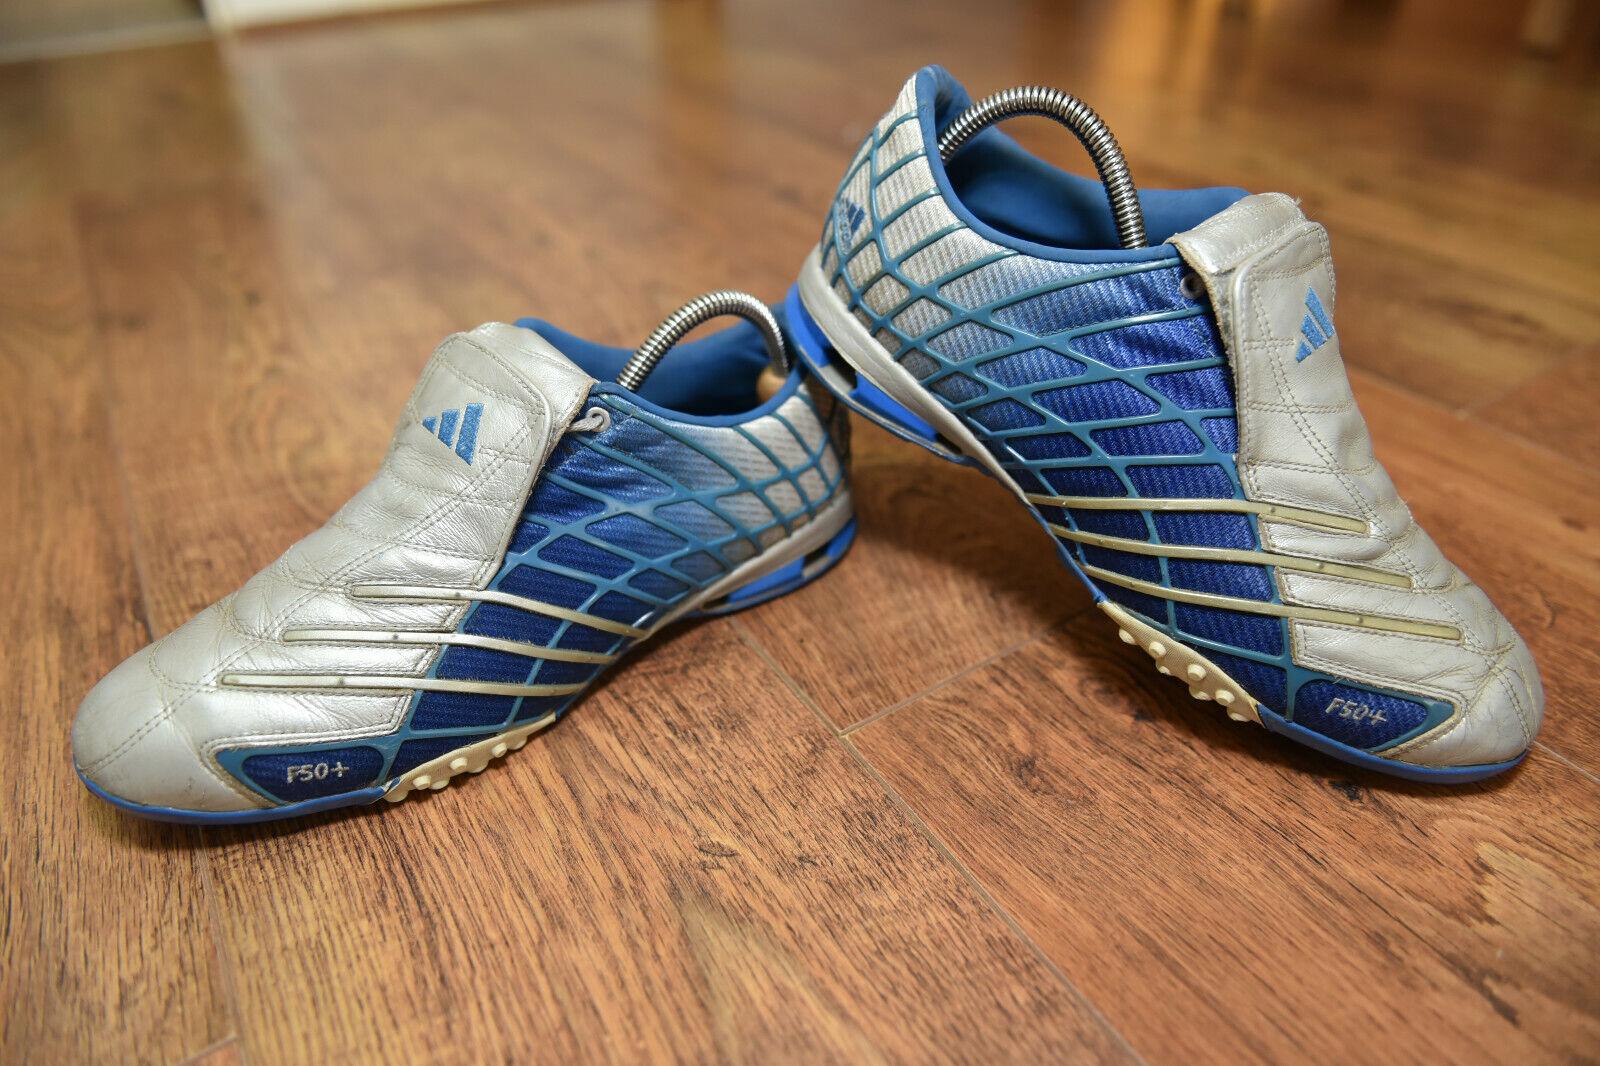 Adidas + F50 Araña A3 AG Astro Turf Fútbol botas Zapatillas 9 manía Tunit